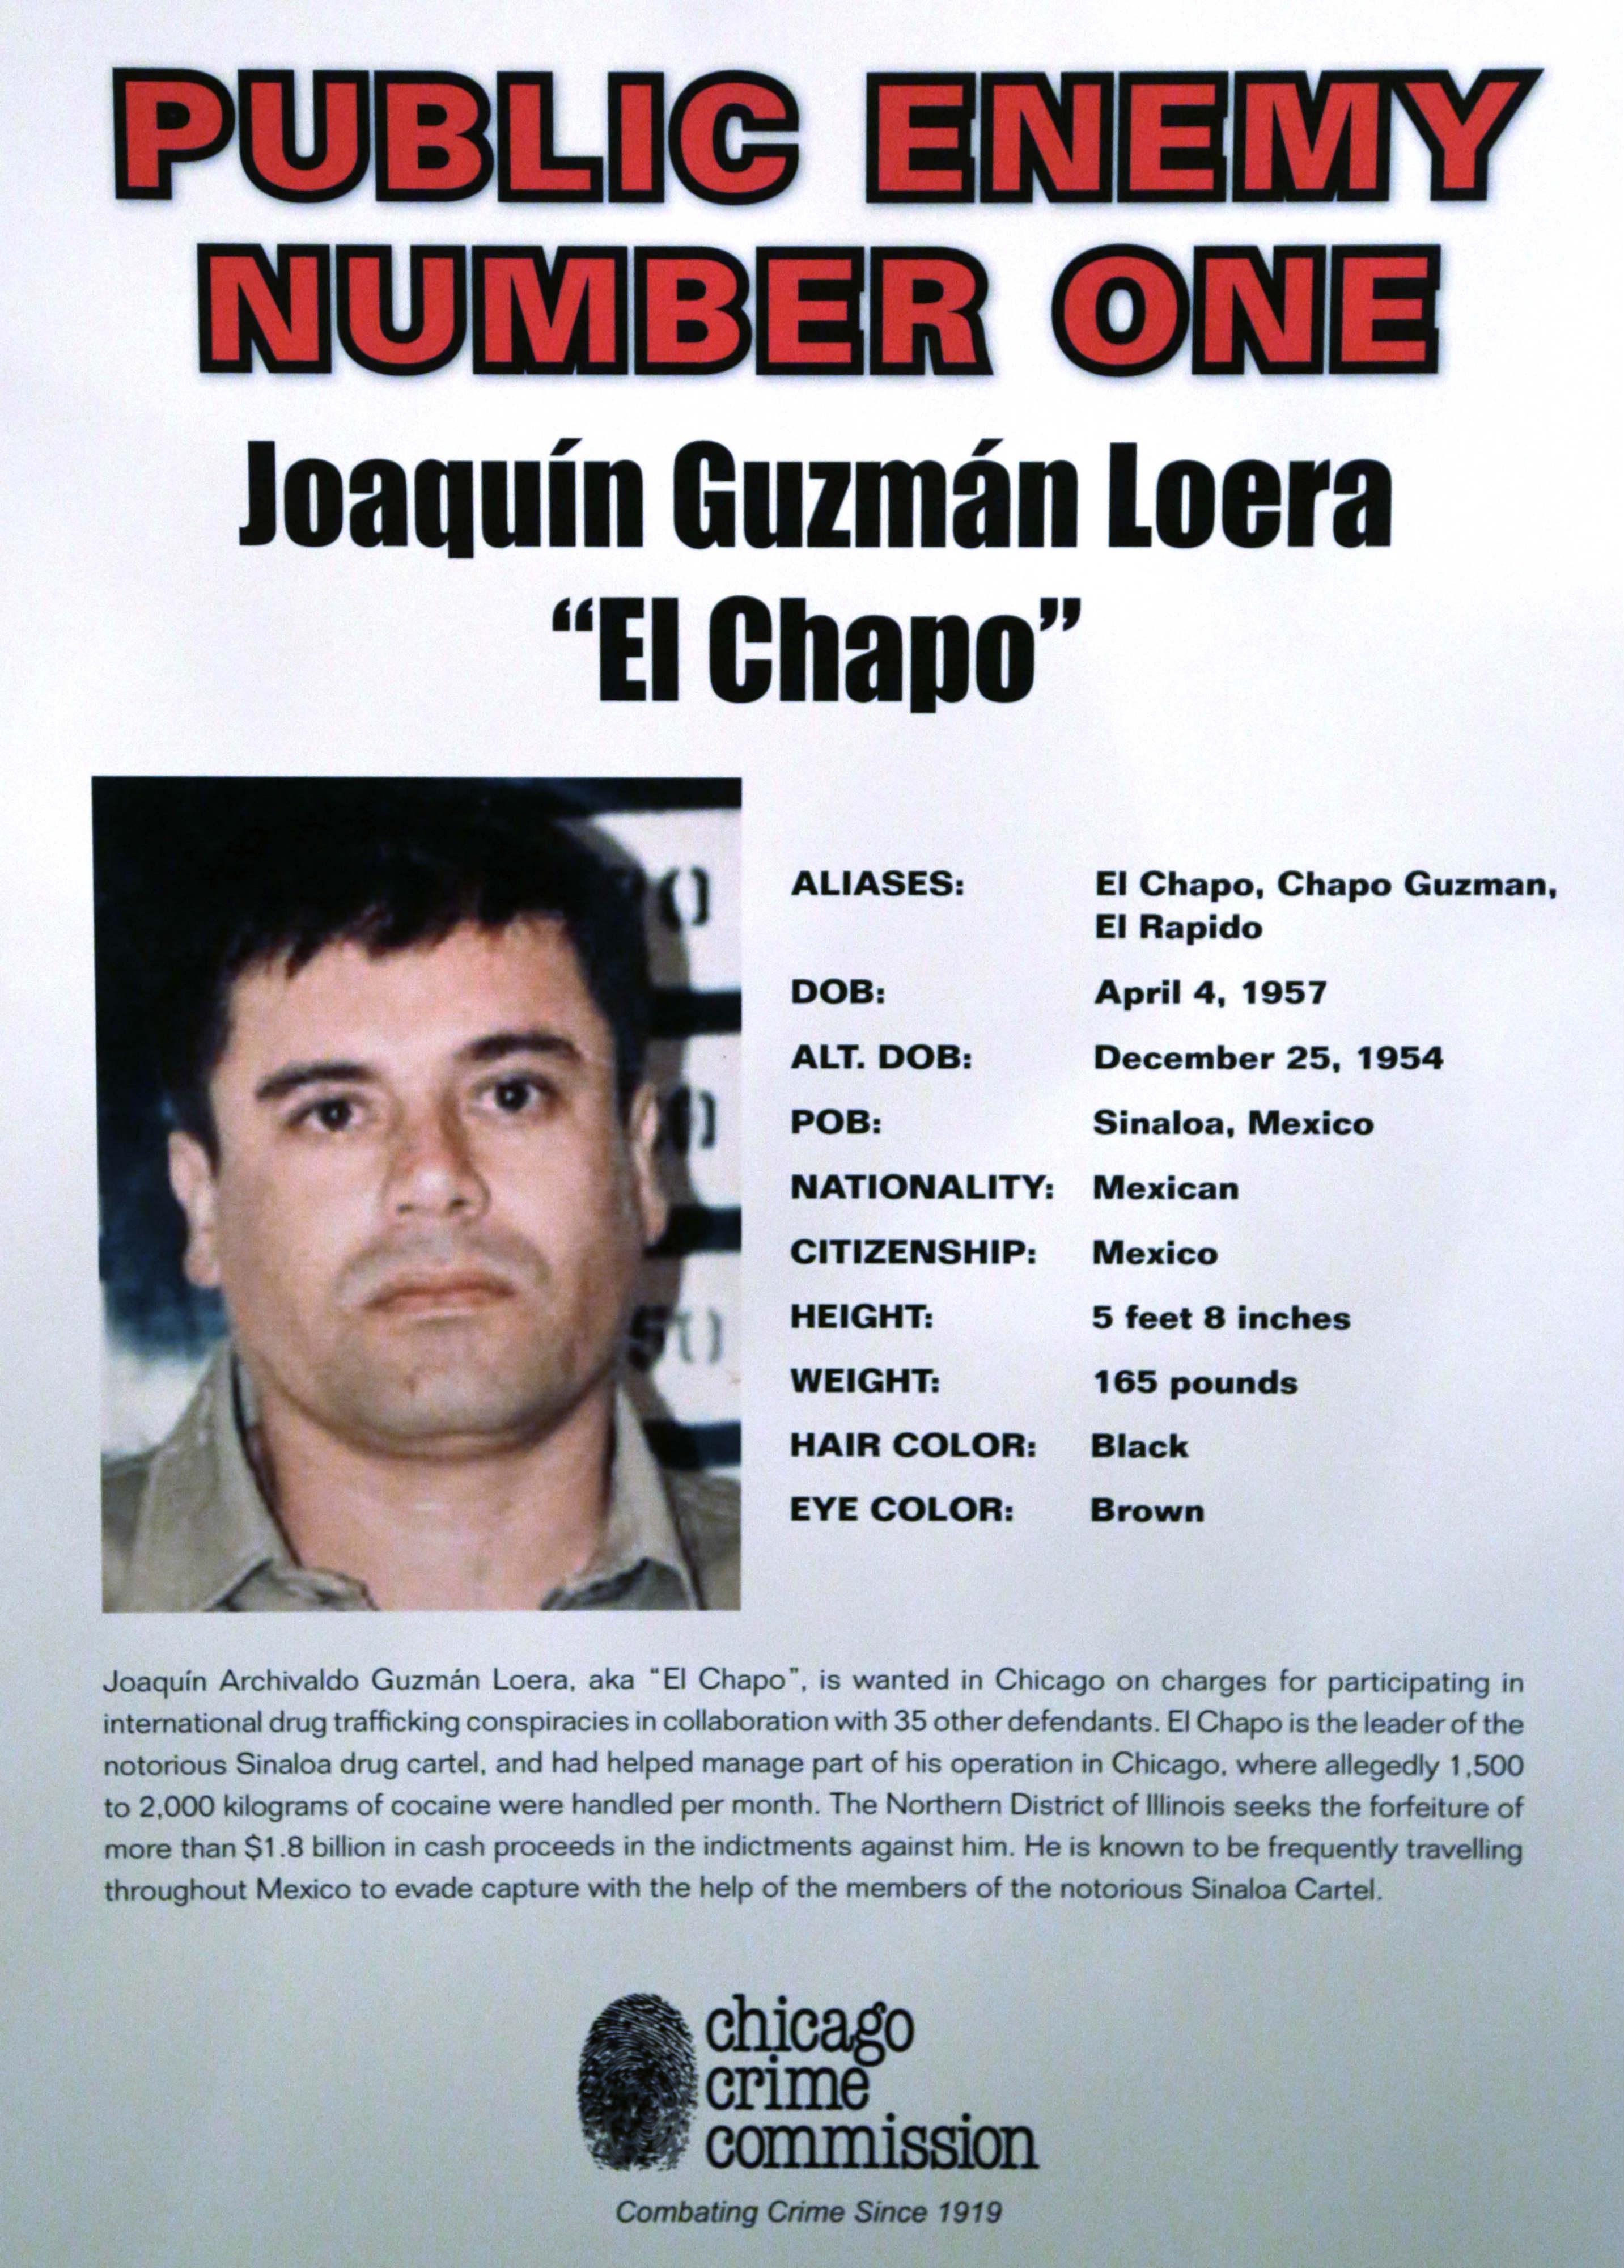 Joaquin ``El Chapo'' Guzman, a drug kingpin in Mexico